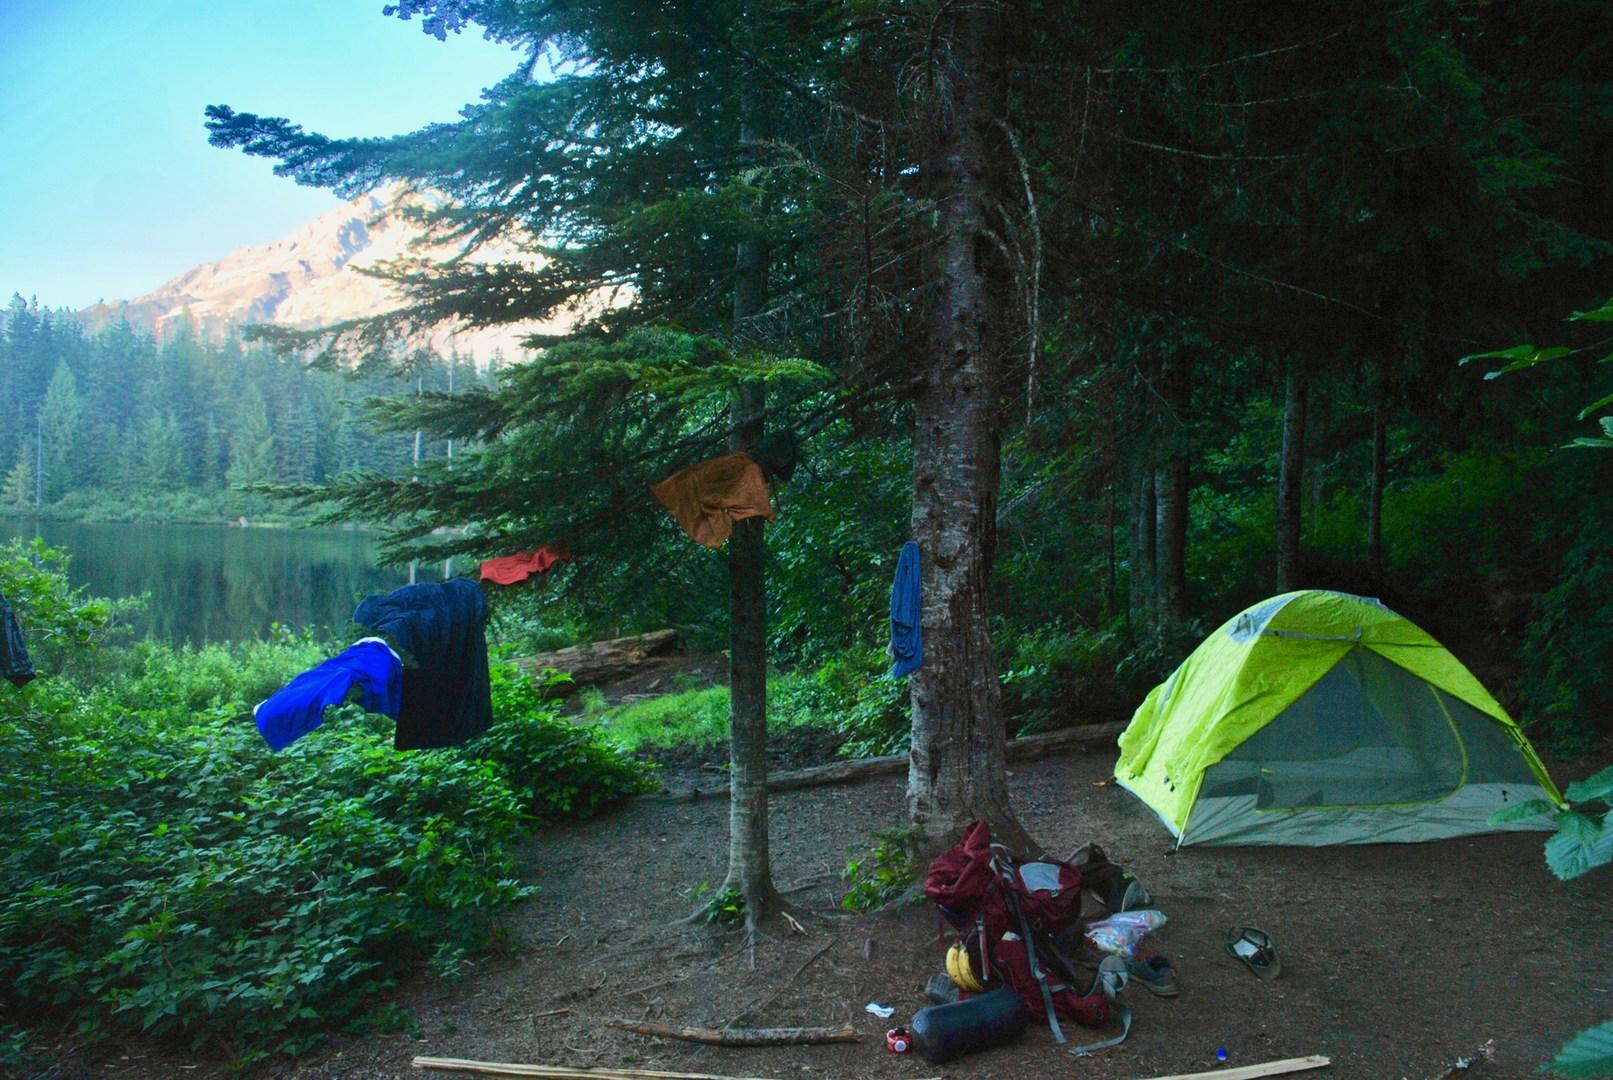 dispersed camping public lands